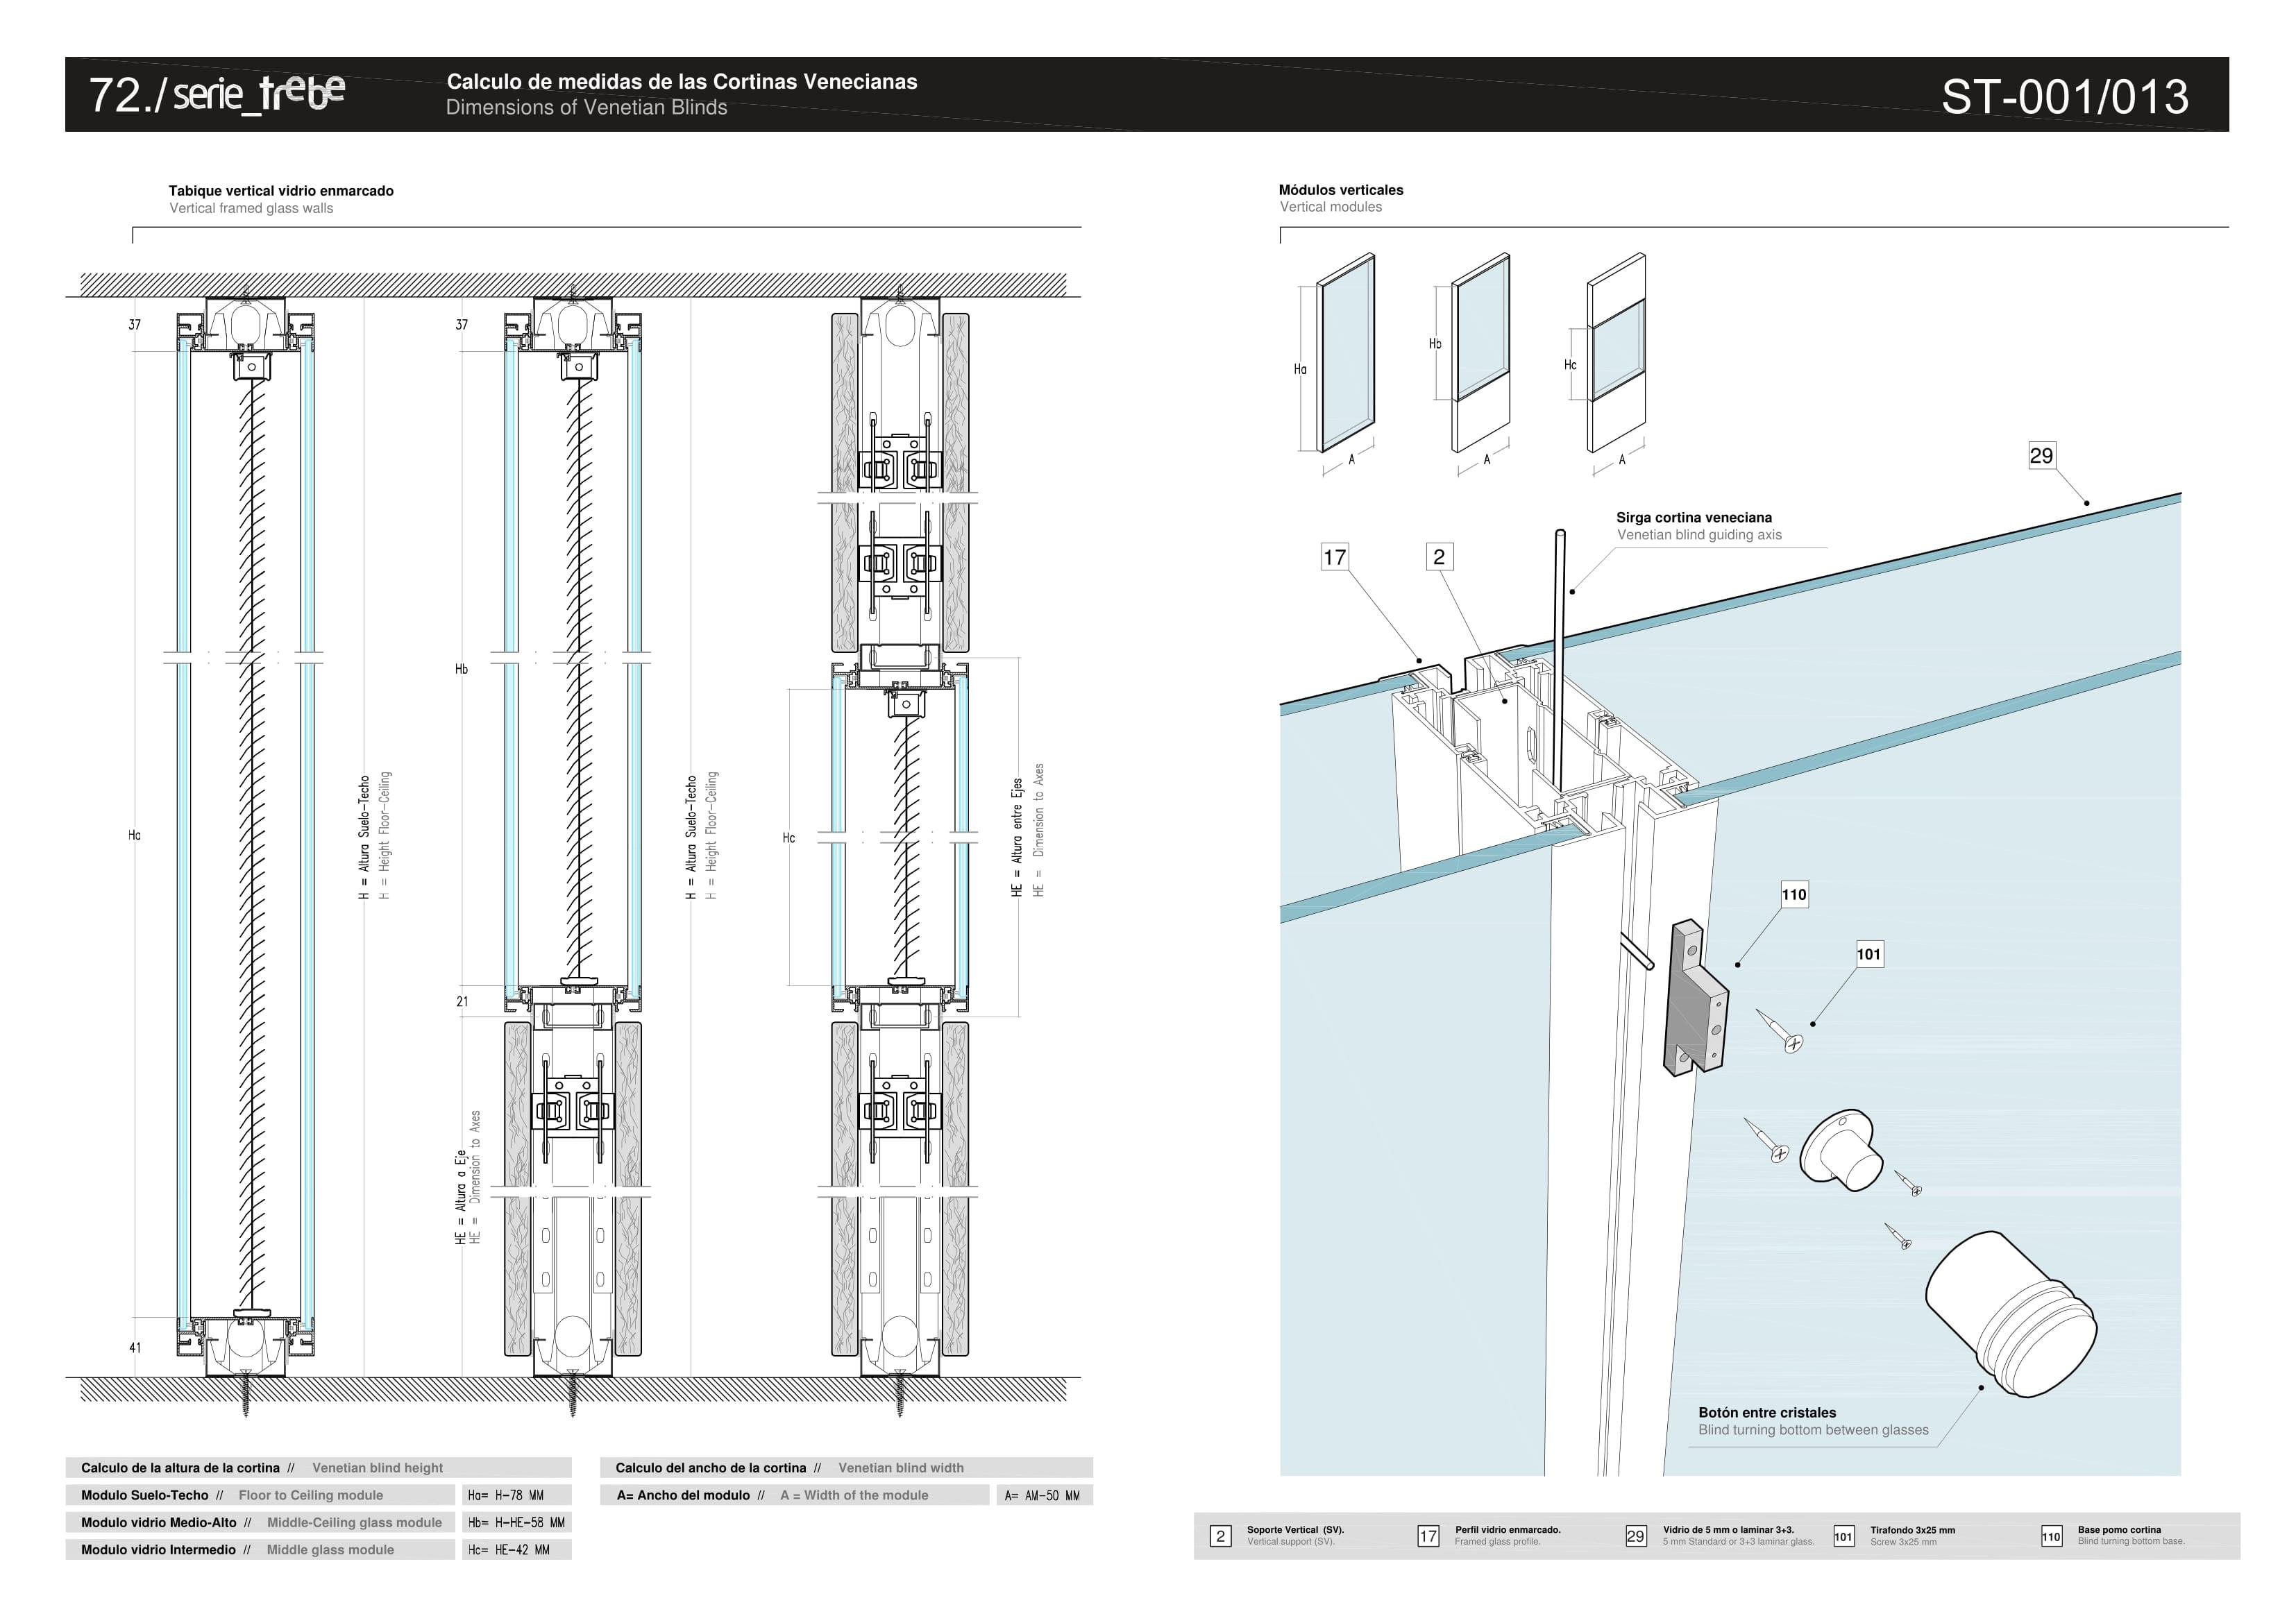 cortinas venecianas a medida hacia garbo catalogo tecnico serie trebe cas eng v rev 08 vista pantalla 74 estilo para cortinas venecianas a medida jpg